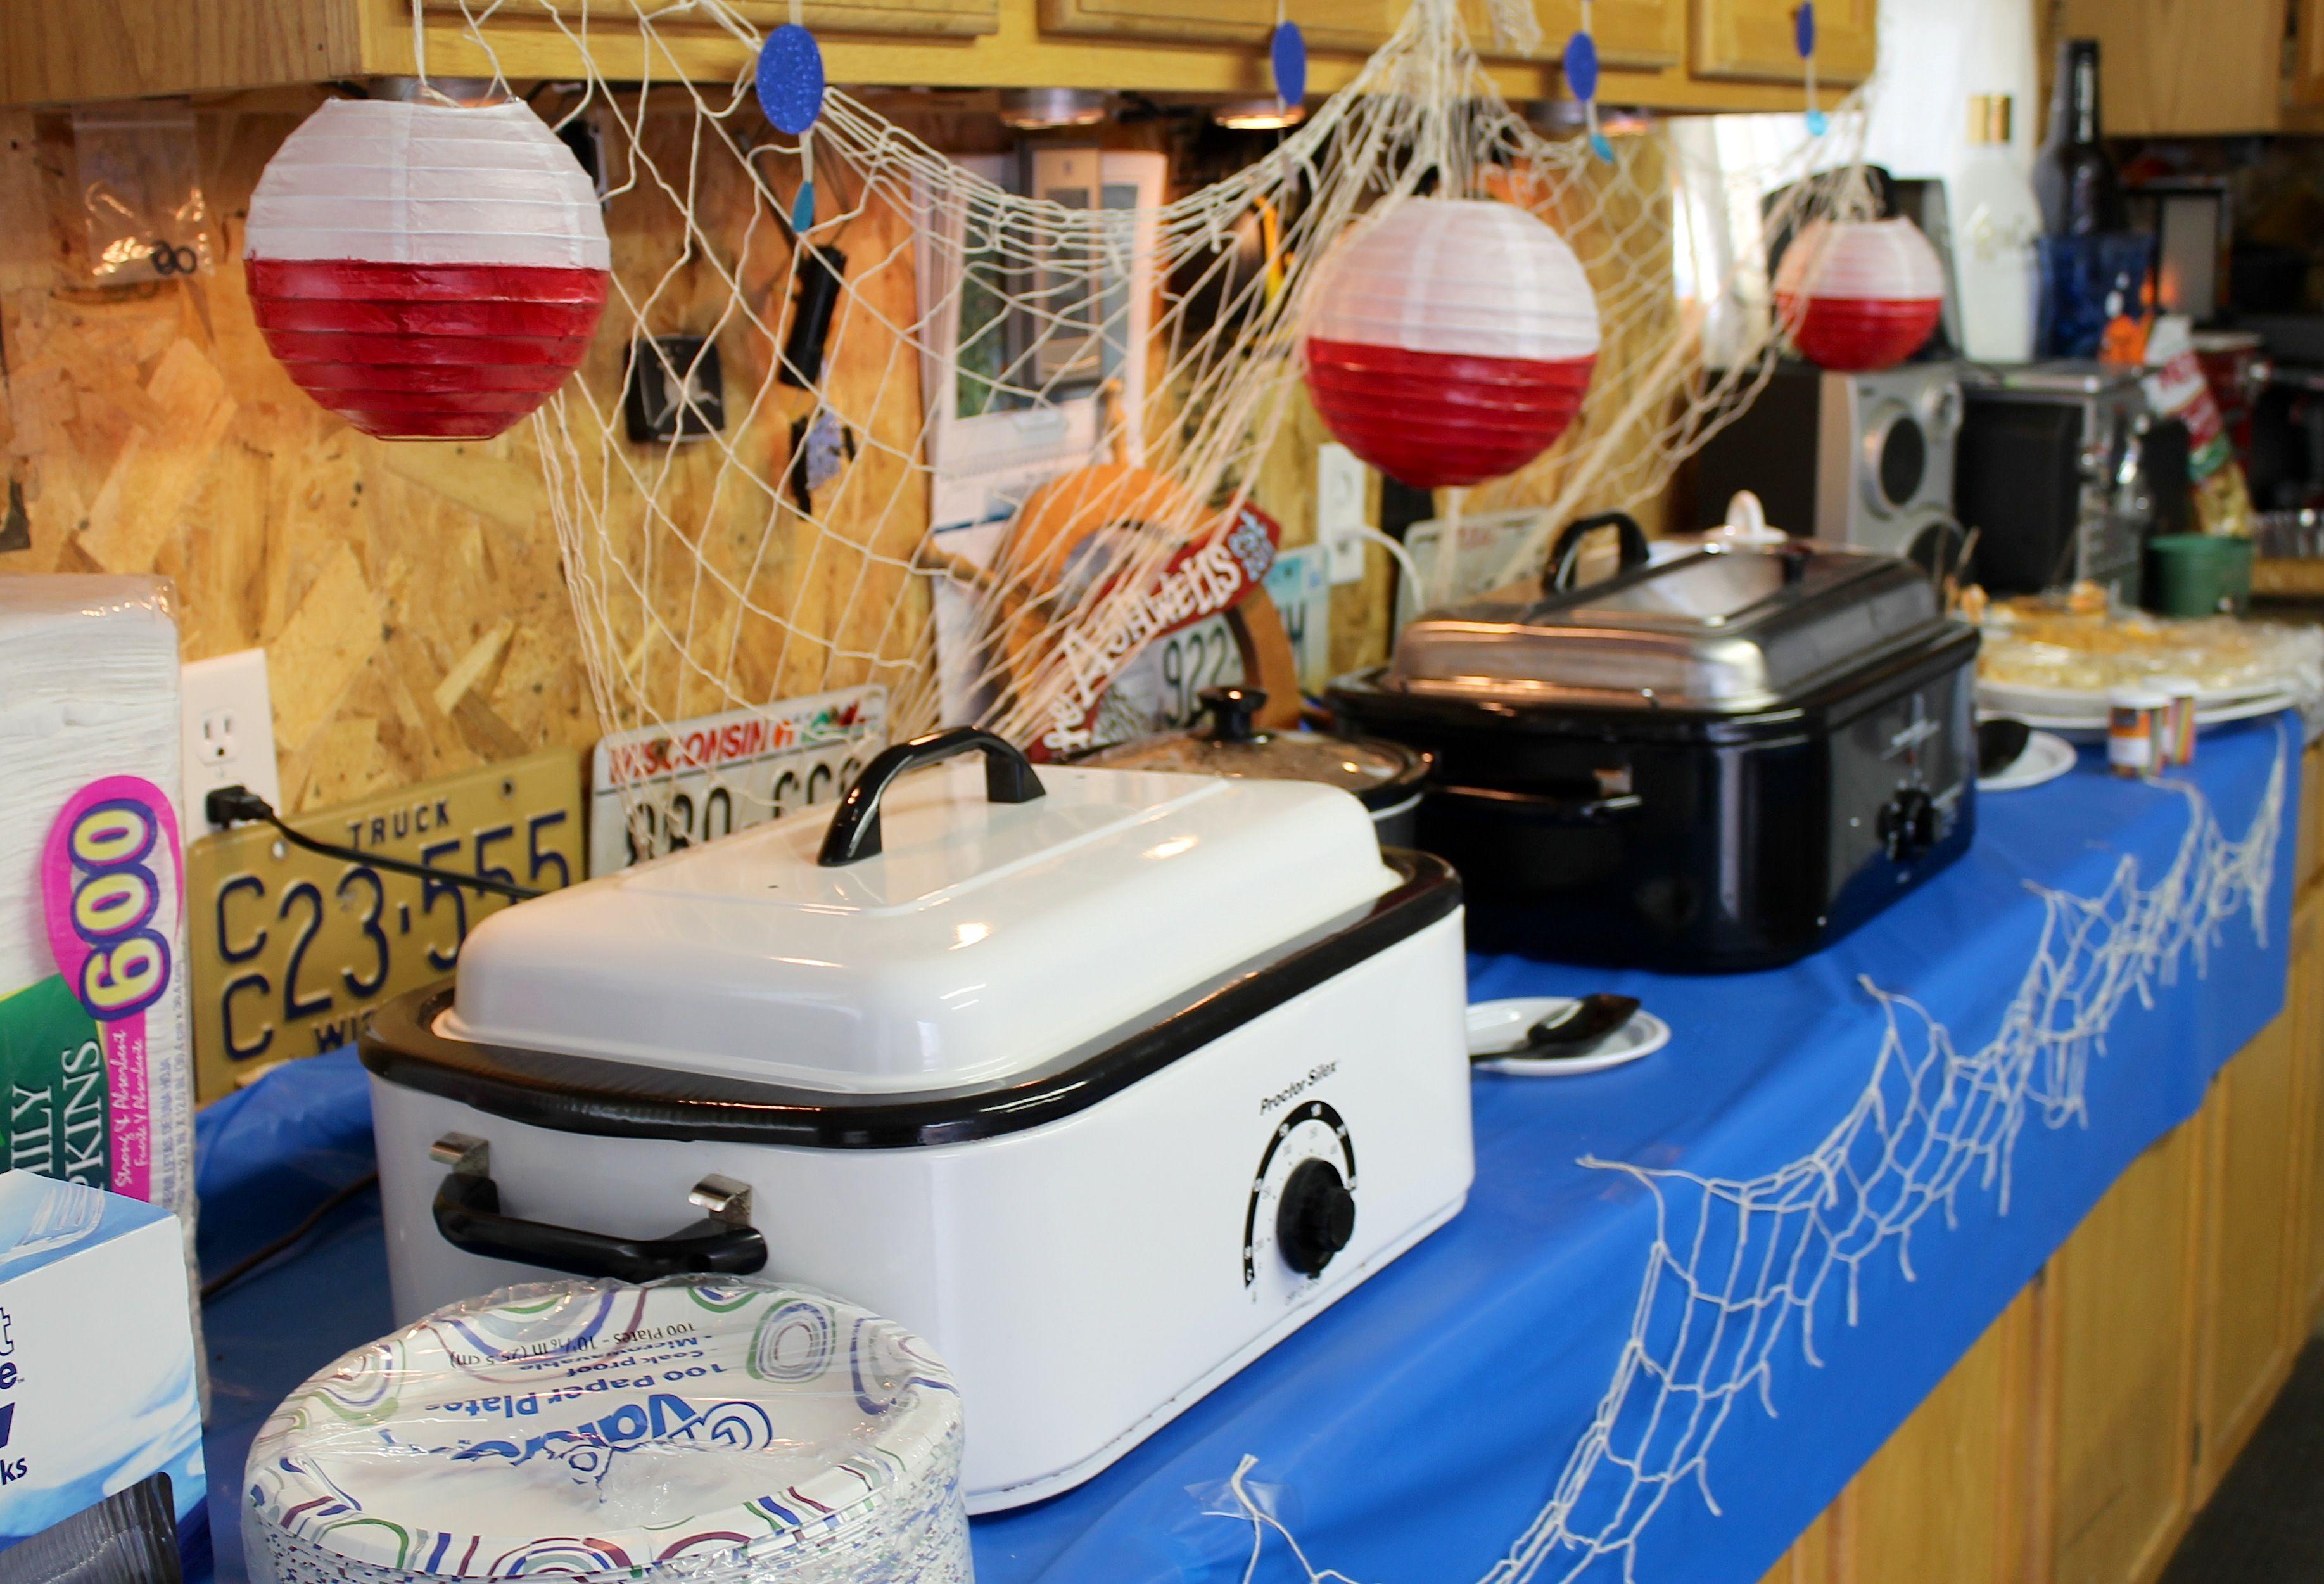 fish fry party ideas